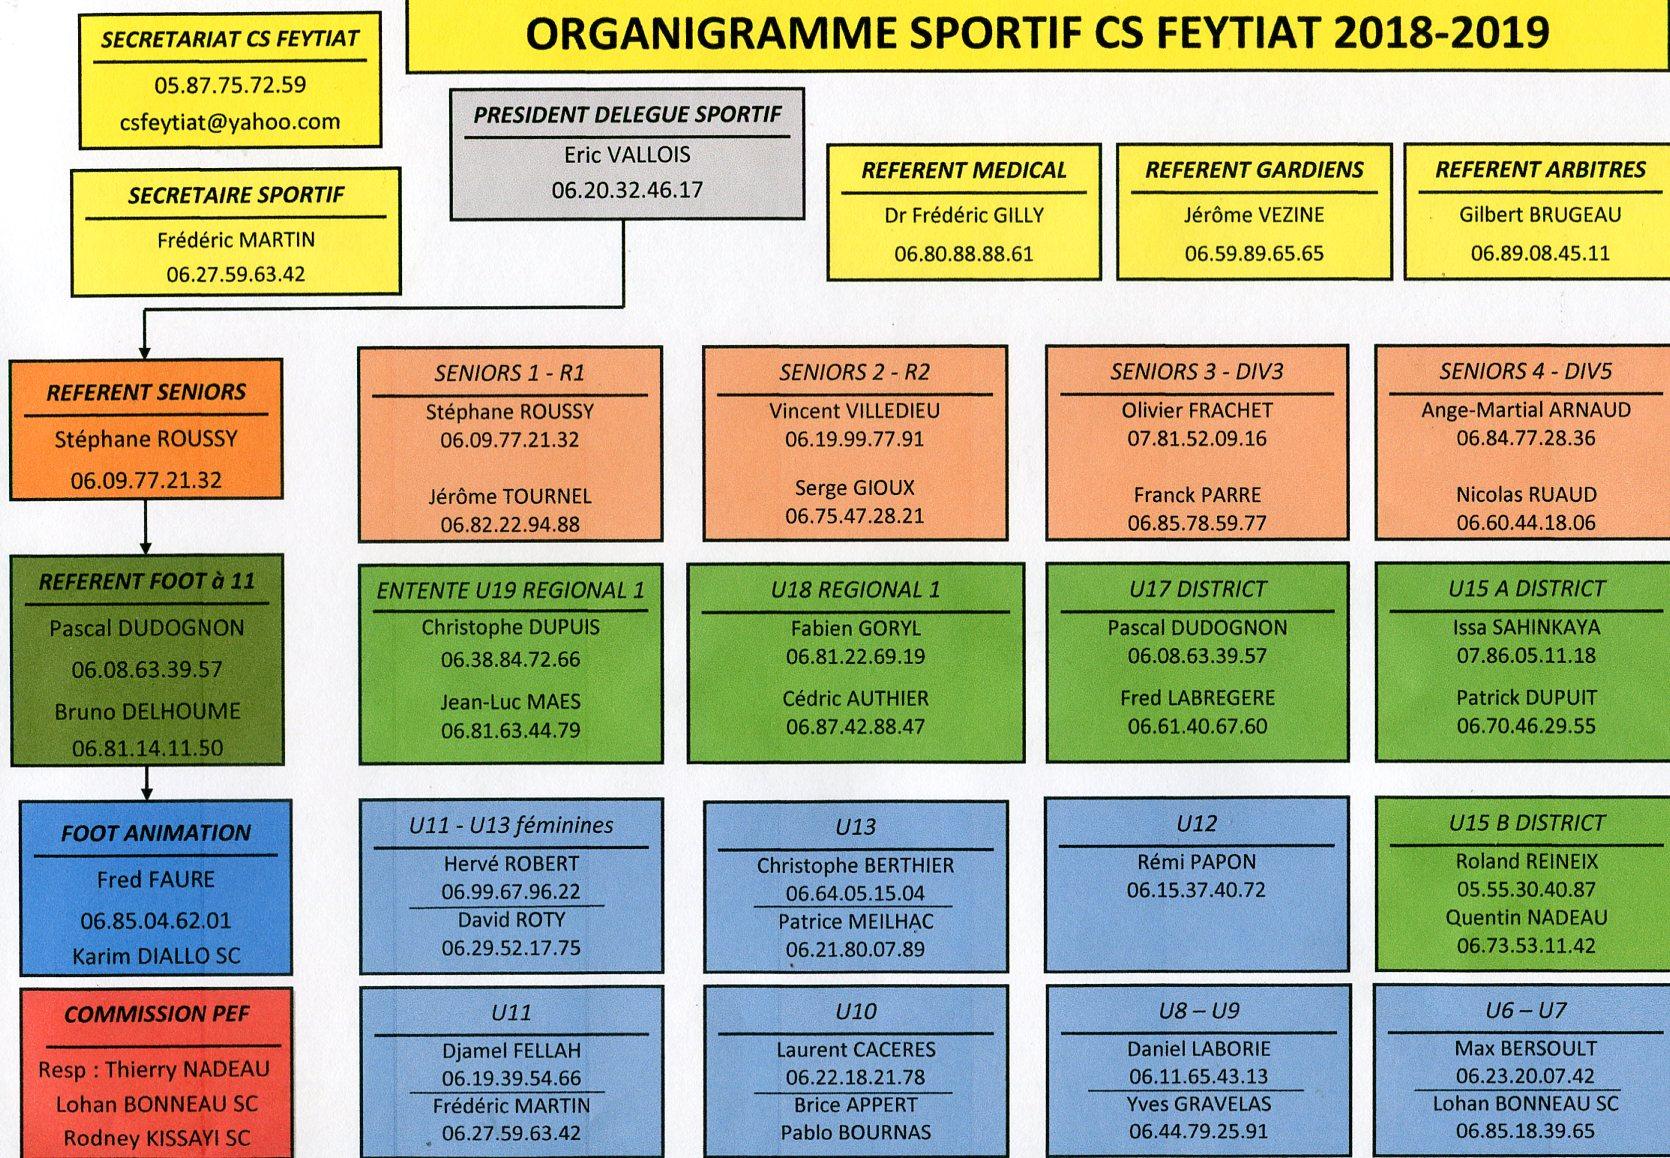 organigramme sportif 2018.jpg